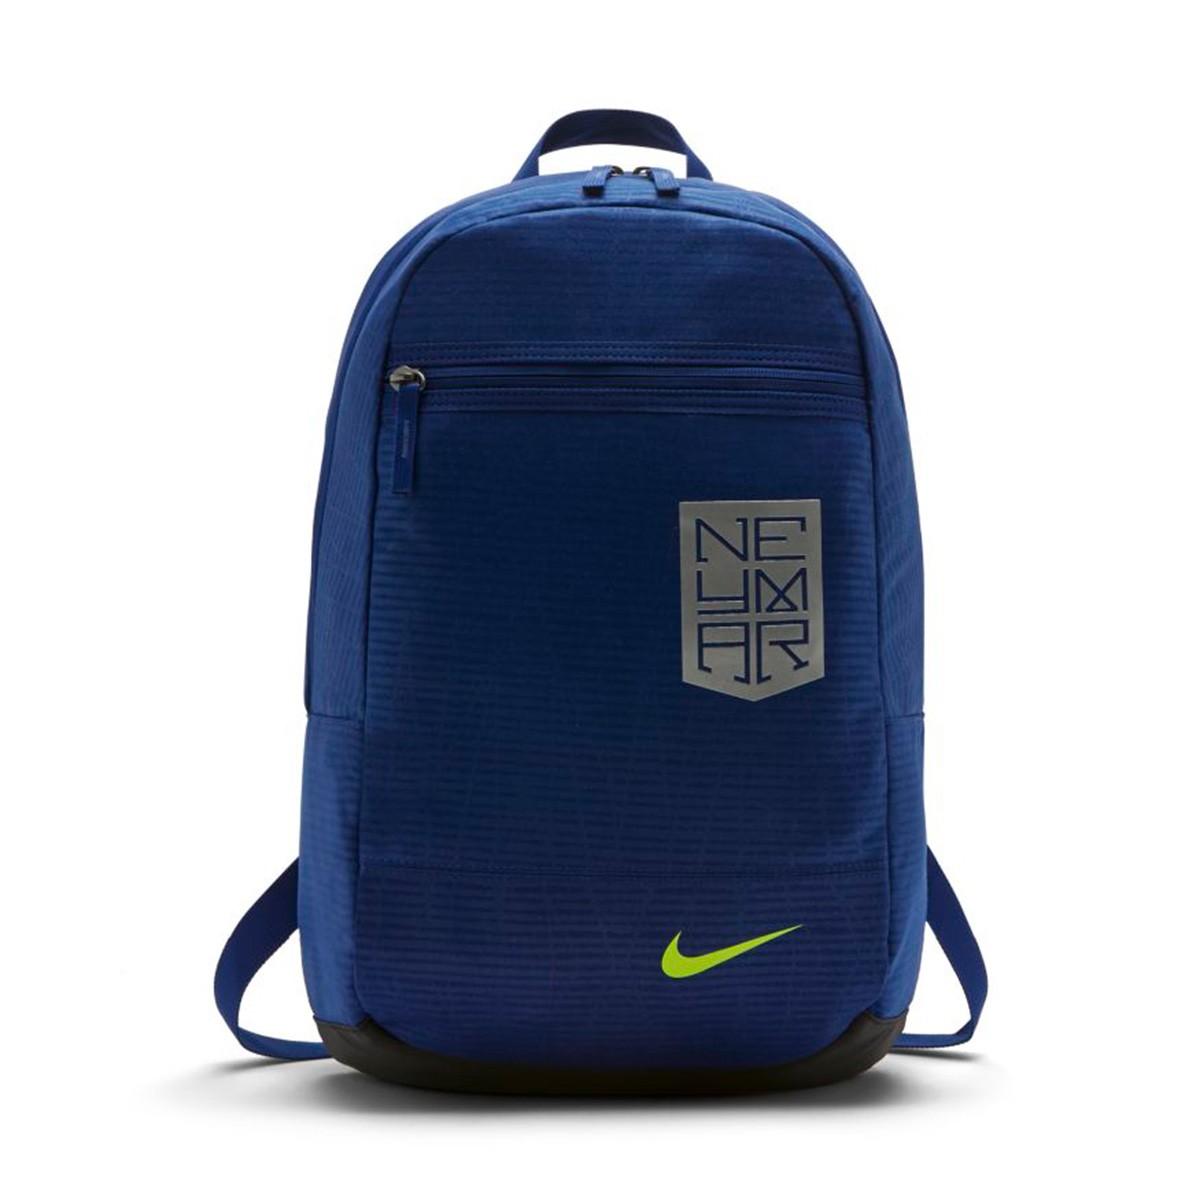 Precio pagable calidad primero estilo de moda de 2019 Mochila Neymar Football Neymar Niño Deep royal blue-Deep royal blue-Volt